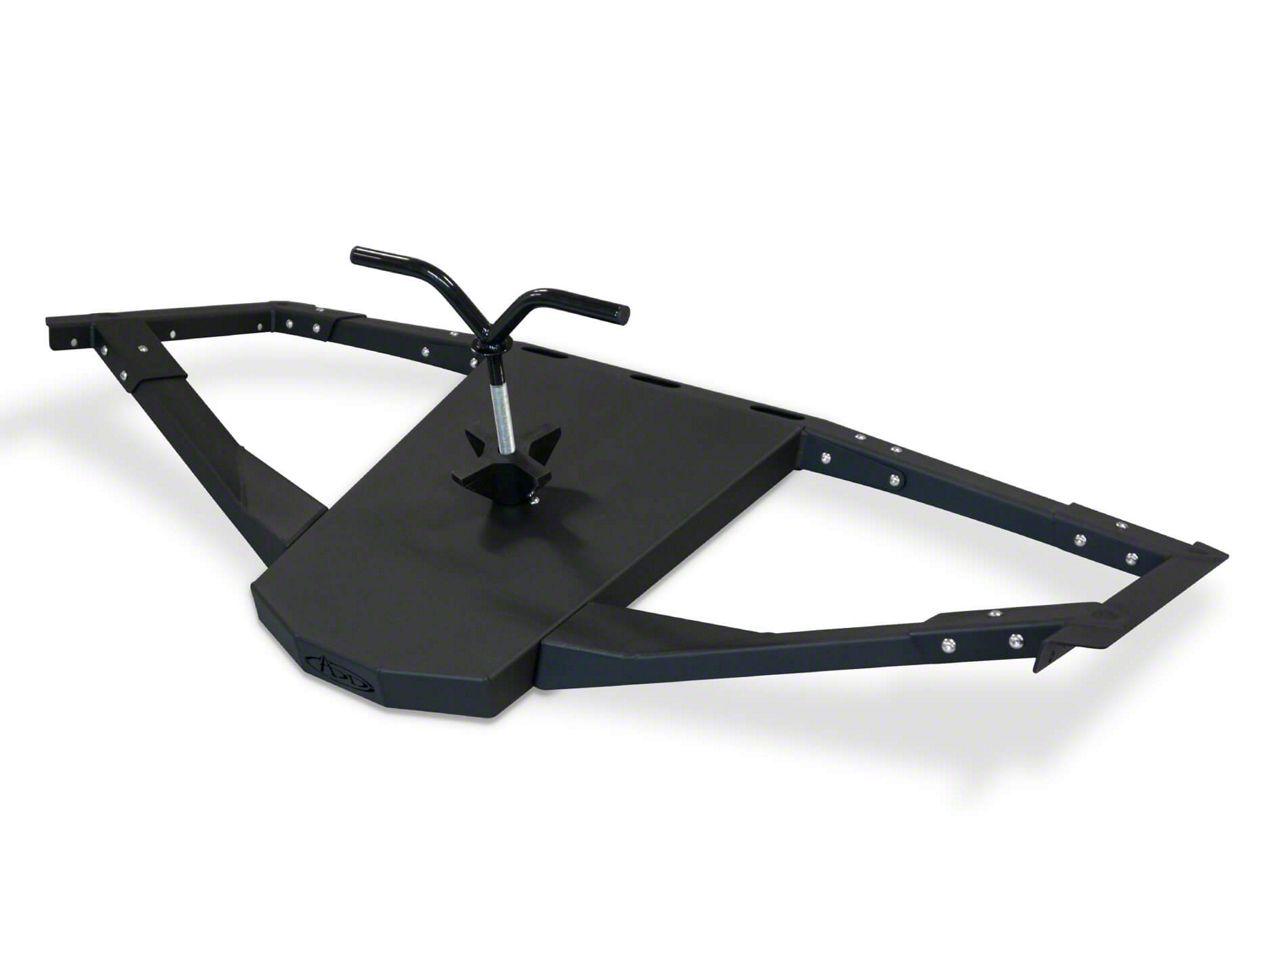 Addictive Desert Designs HoneyBadger Chase Rack Tire Carrier (17-19 F-150 Raptor)